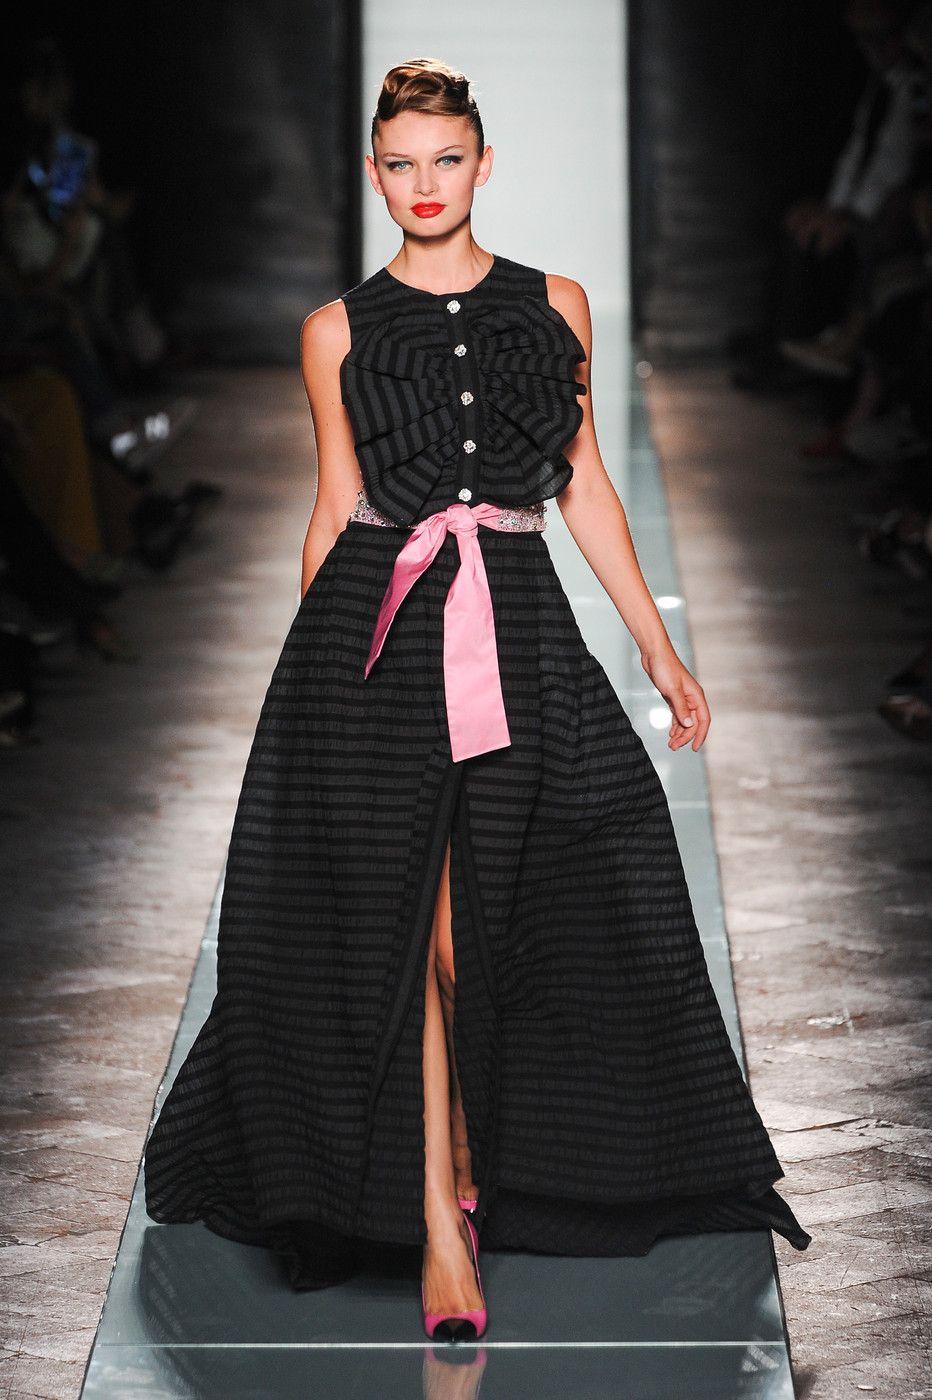 Roccobarocco at Milan Fashion Week Spring 2014 - StyleBistro